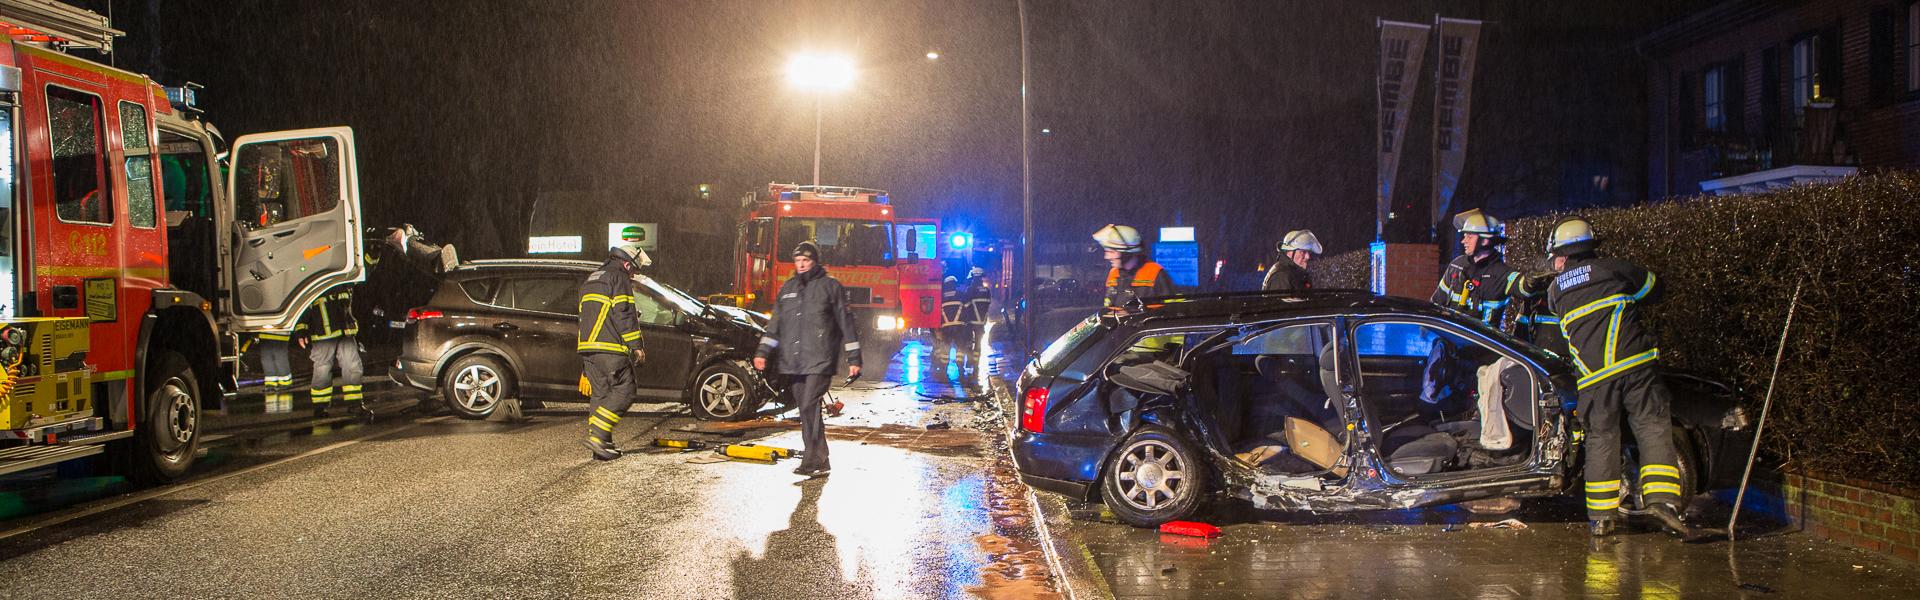 19.03.2017 – Eingeklemmte Person nach Verkehrsunfall in Langenhorn